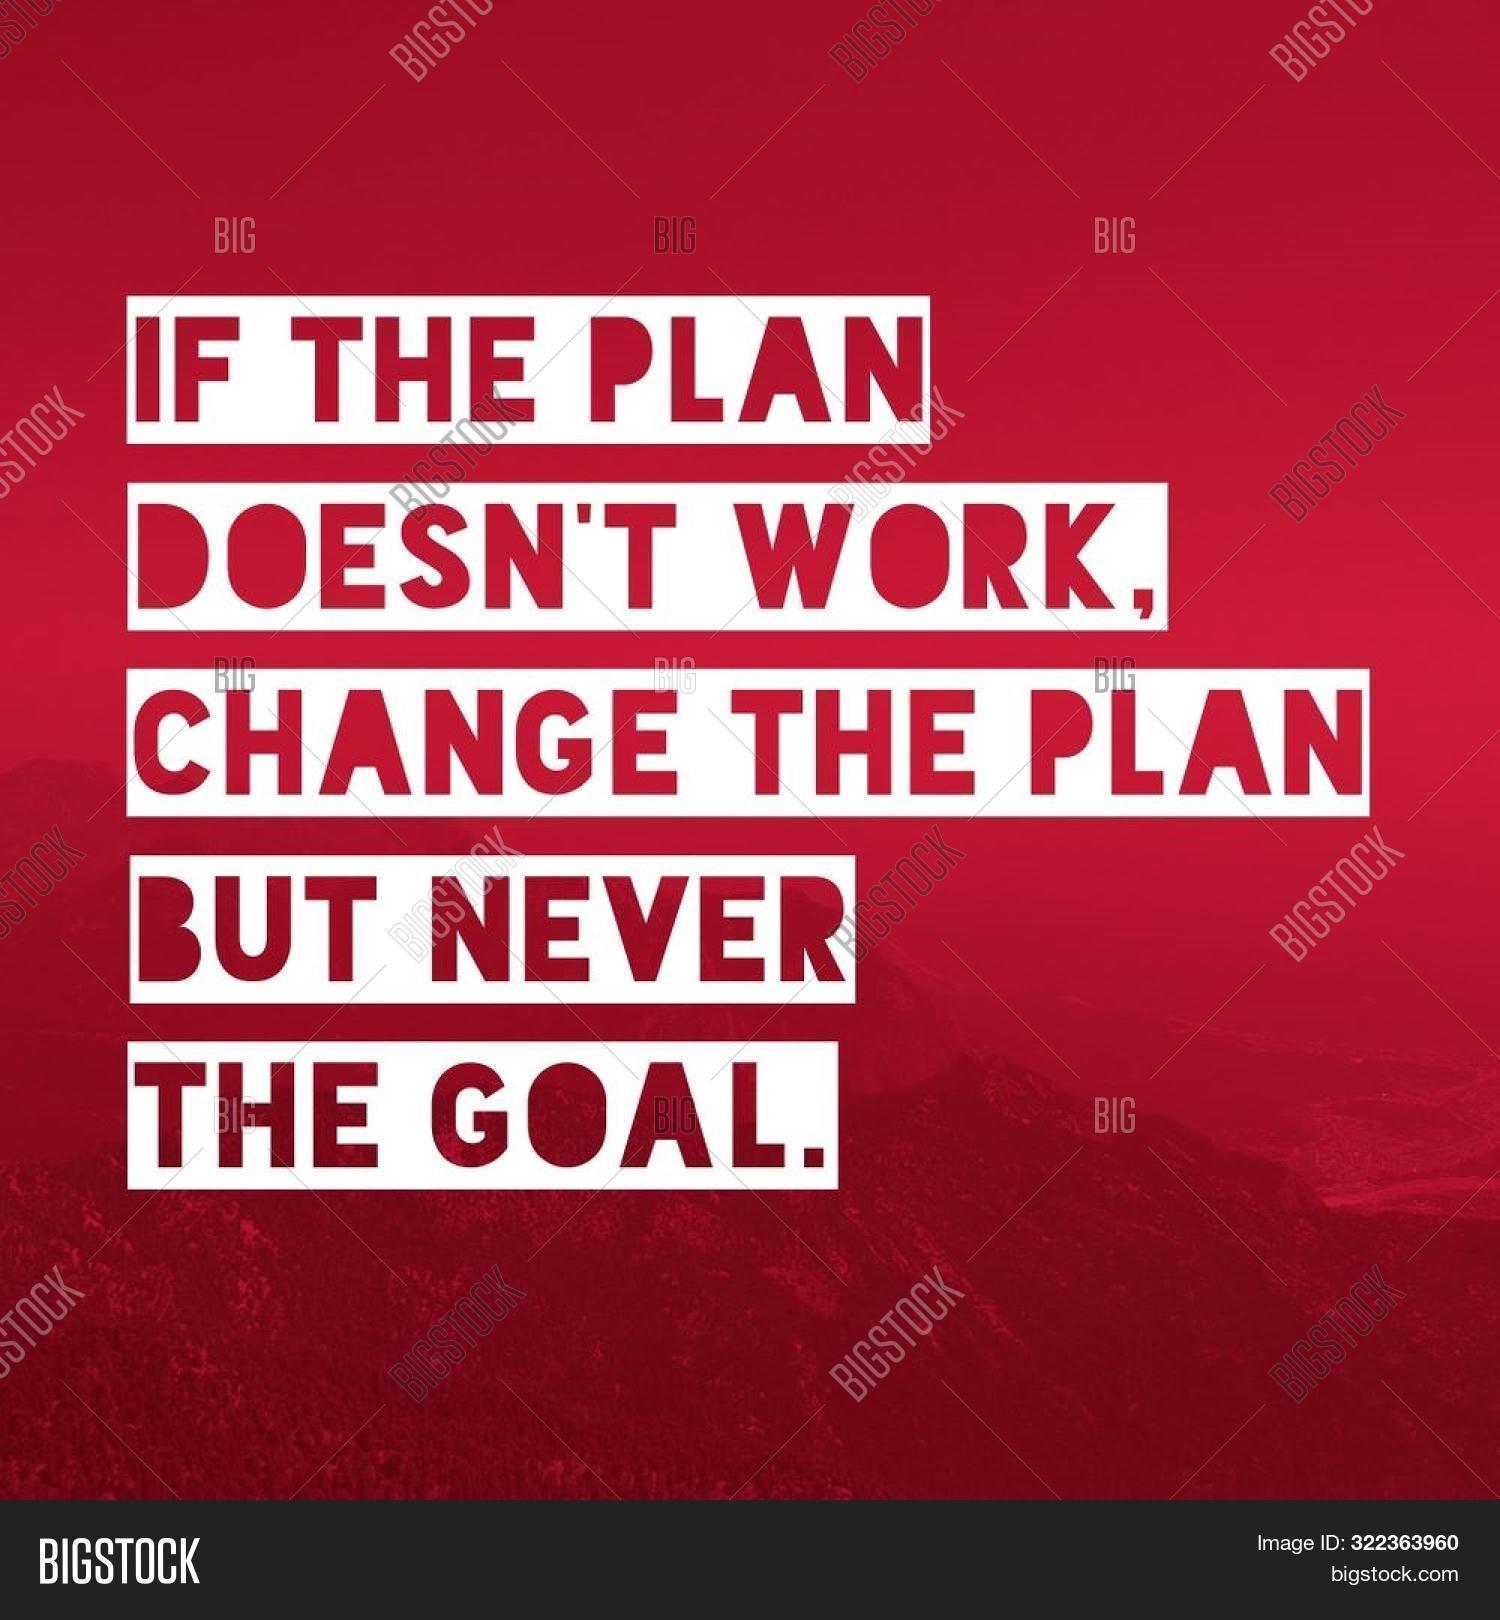 Best Motivational Image Photo Free Trial Bigstock